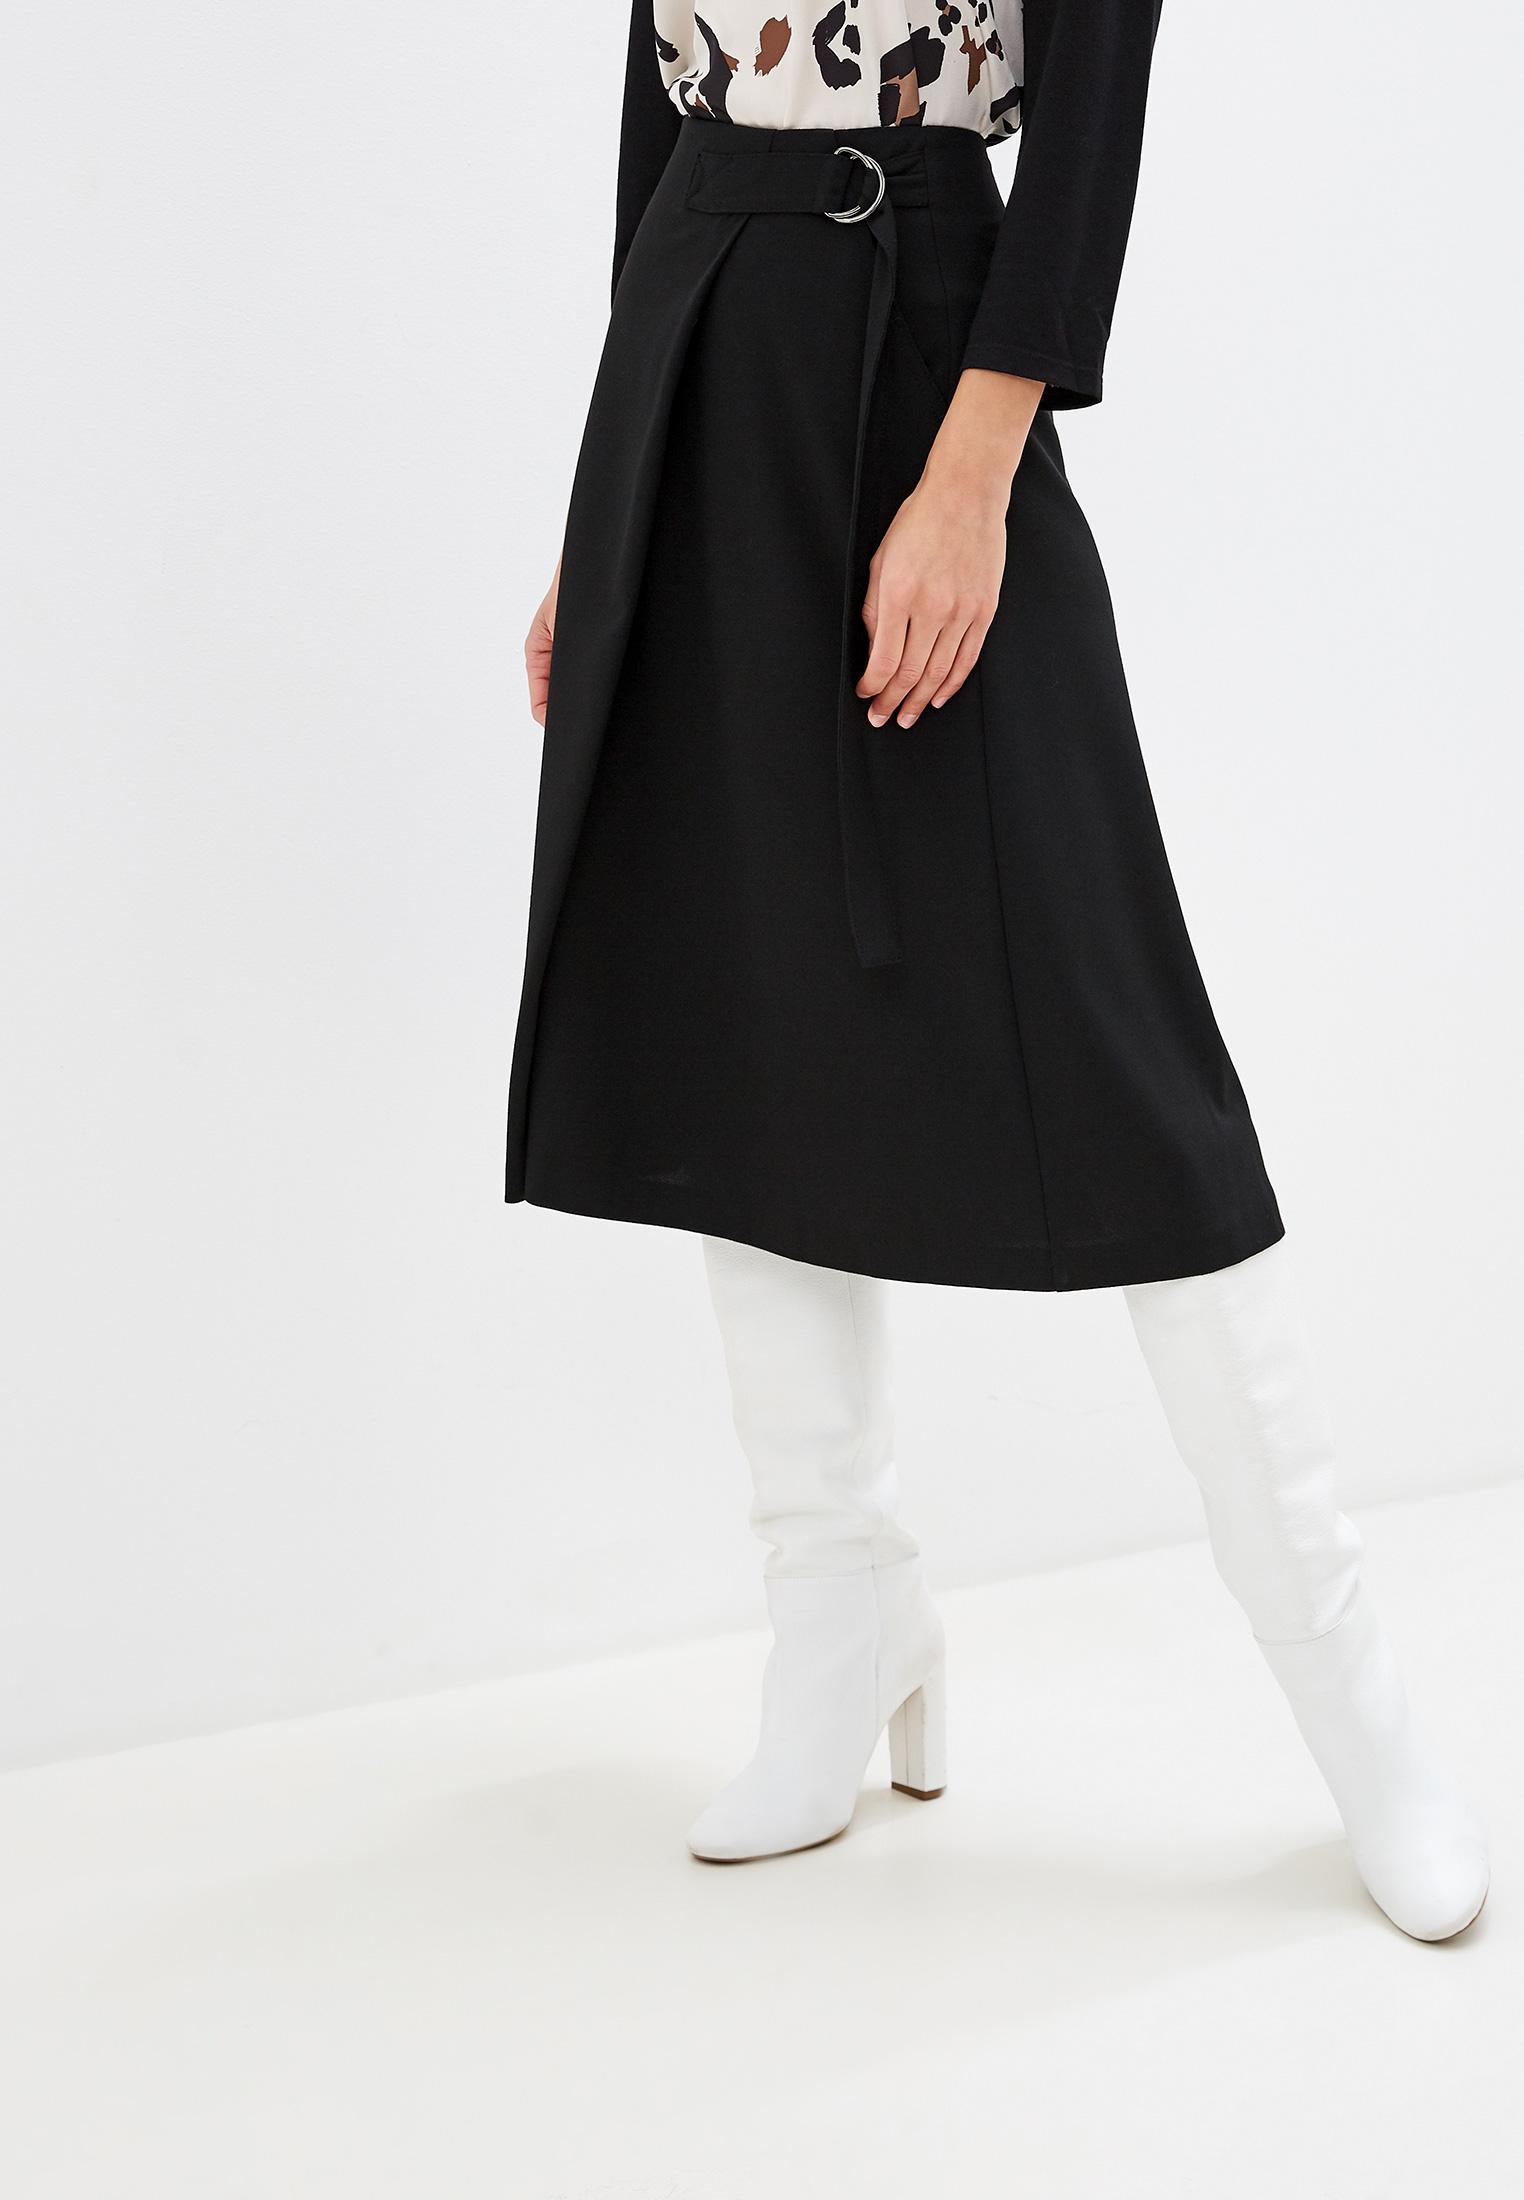 Широкая юбка Gerry Weber (Гарри Вебер) 110159-67638